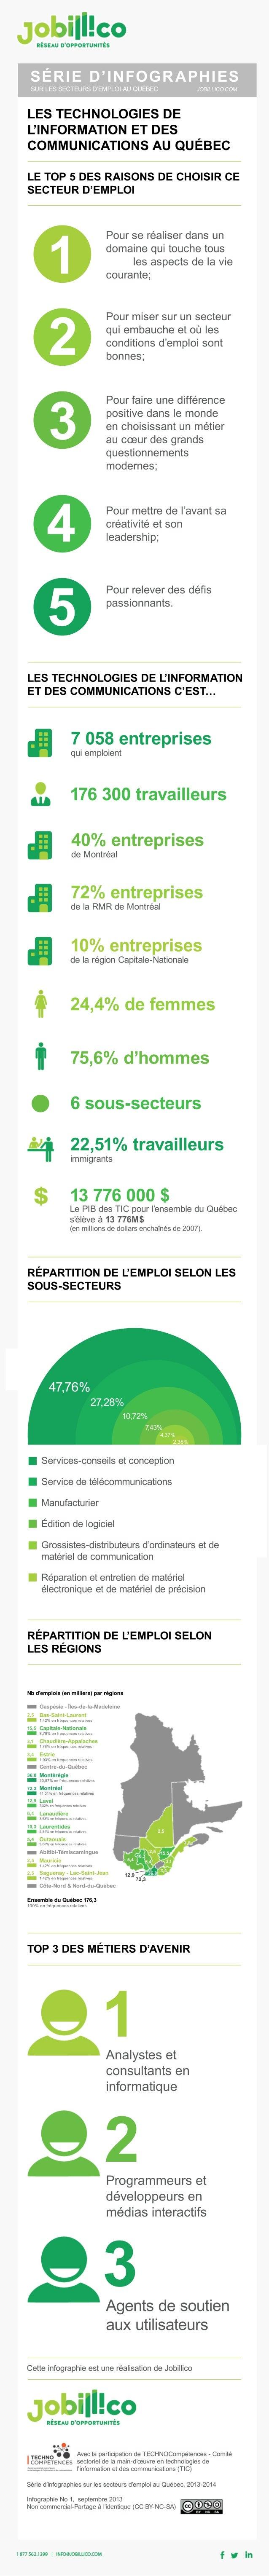 CetteinfographieestuneréalisationdeJobillico Séried'infographiessurlessecteursd'emploiauQuébec,2013-2014 InfographieNo1,se...